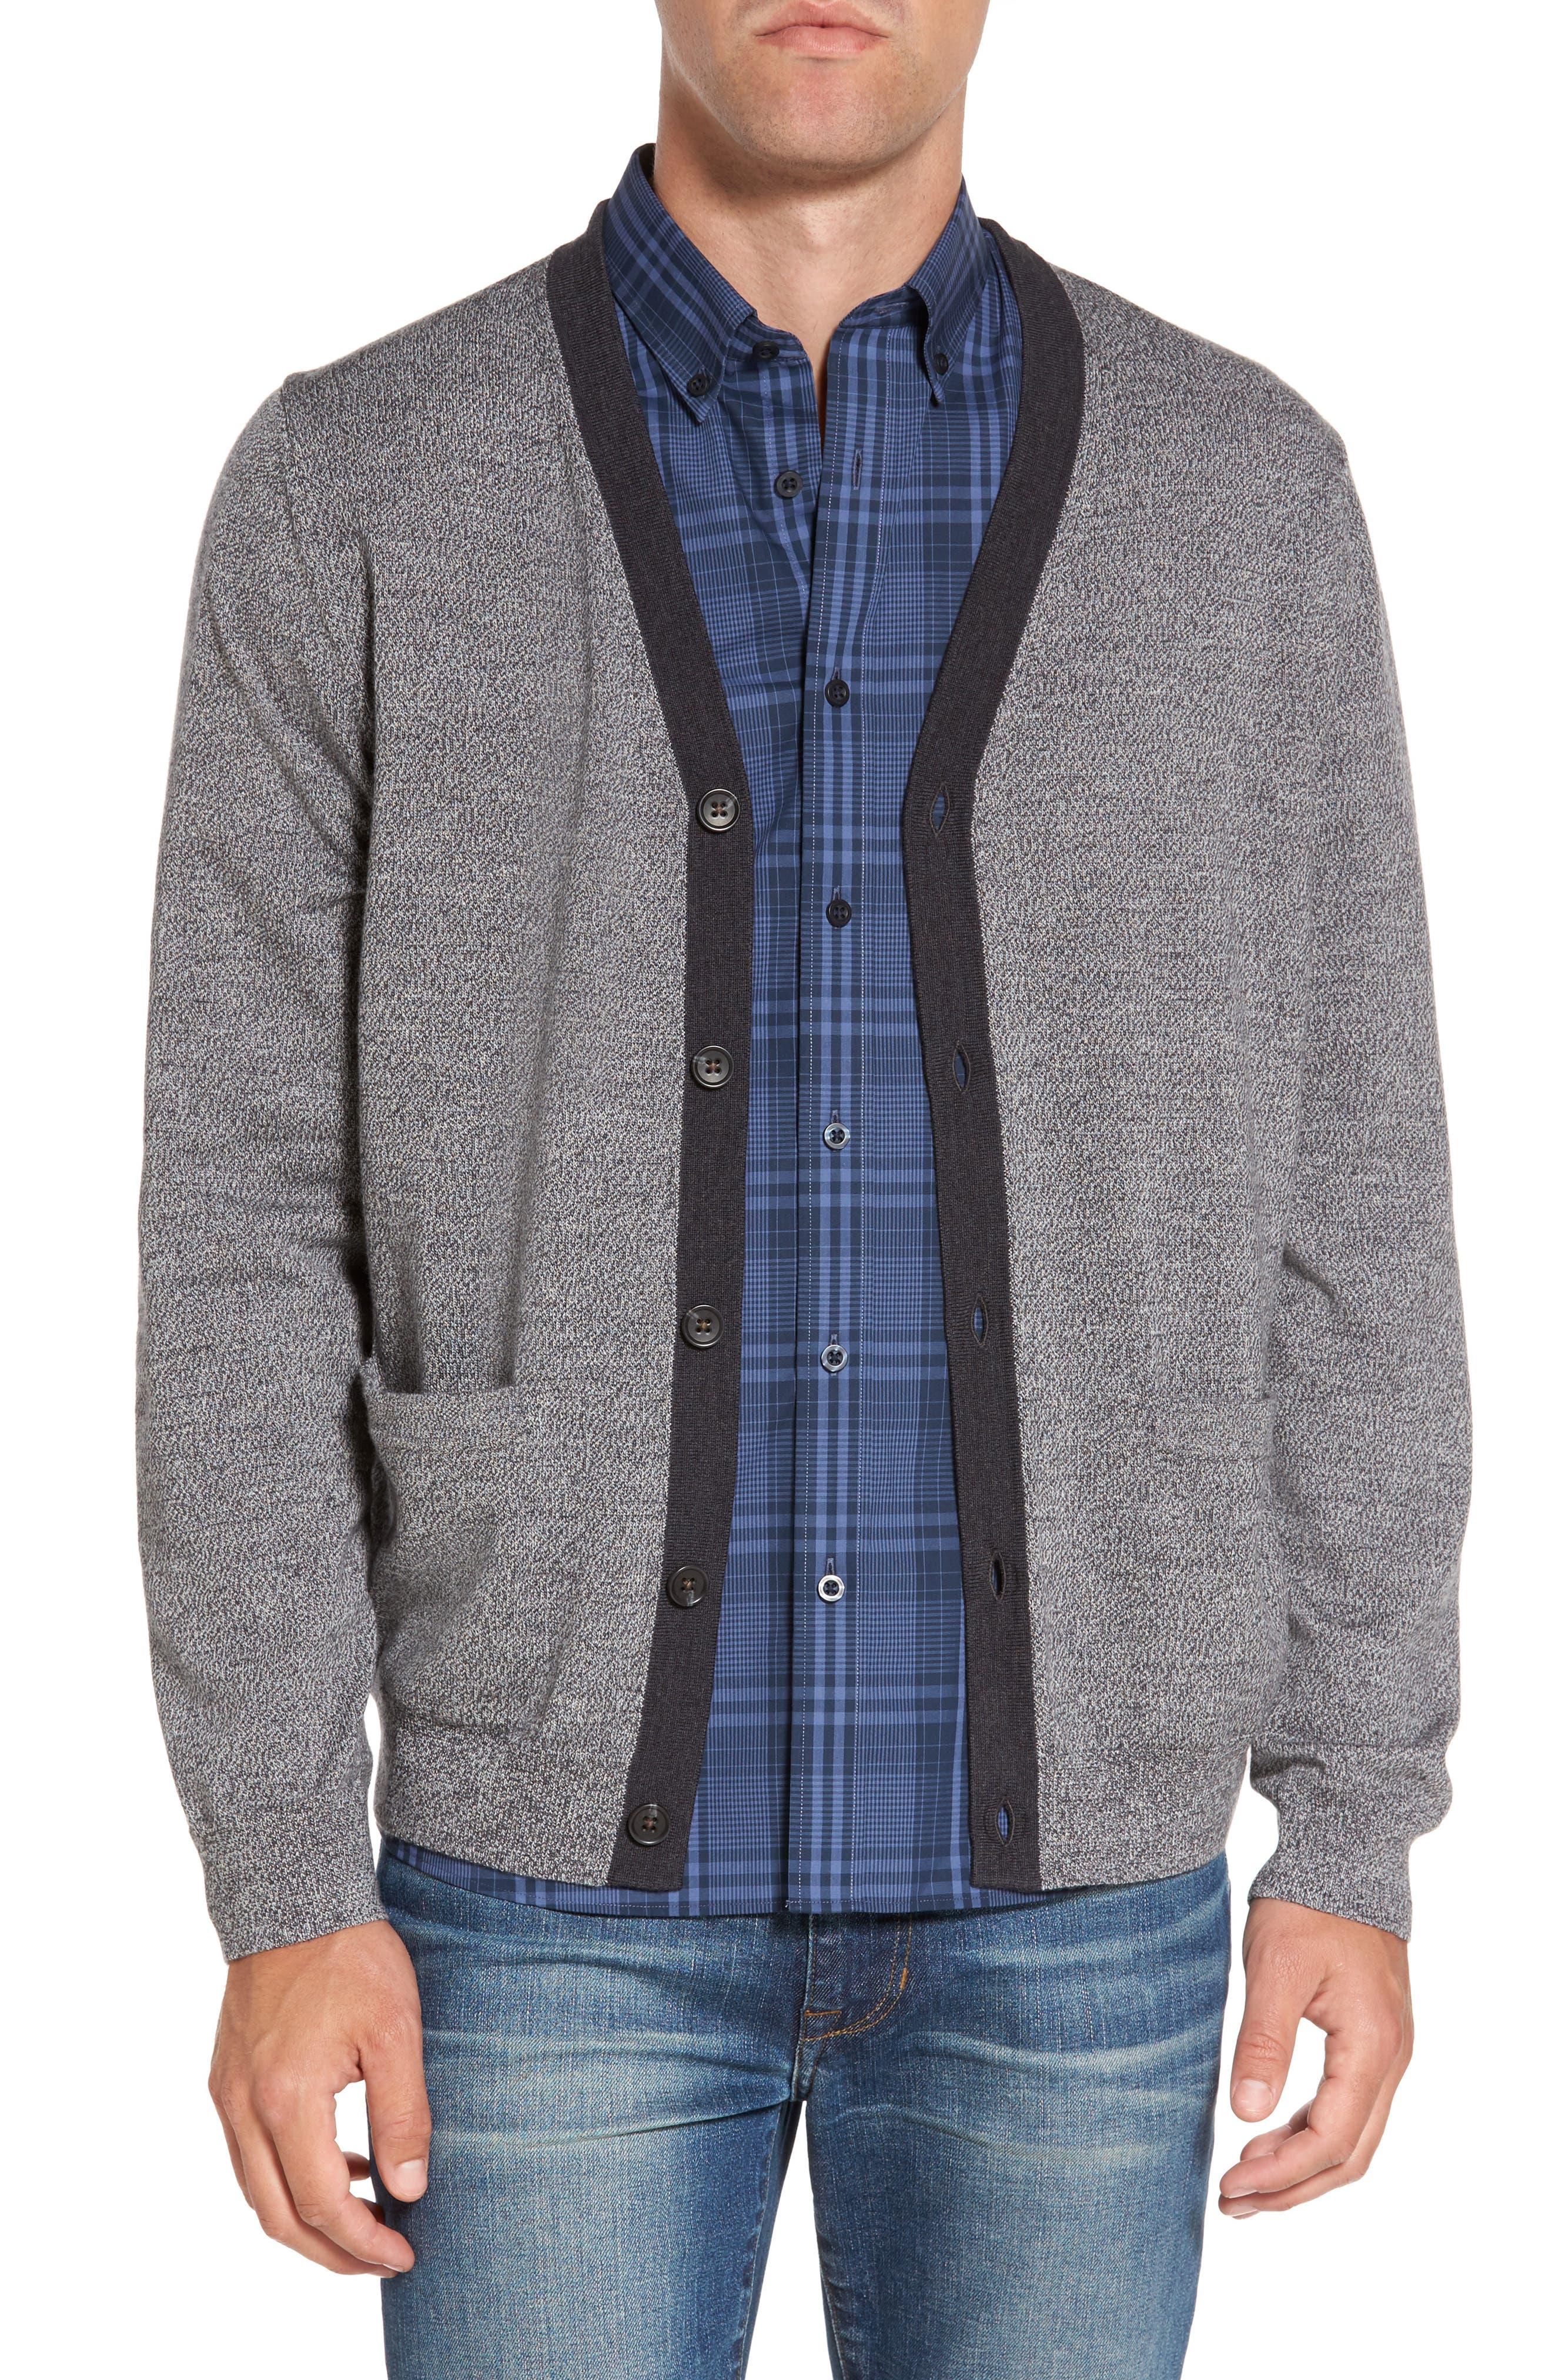 Men\u0027s Cardigan Sweaters \u0026 Jackets   Nordstrom